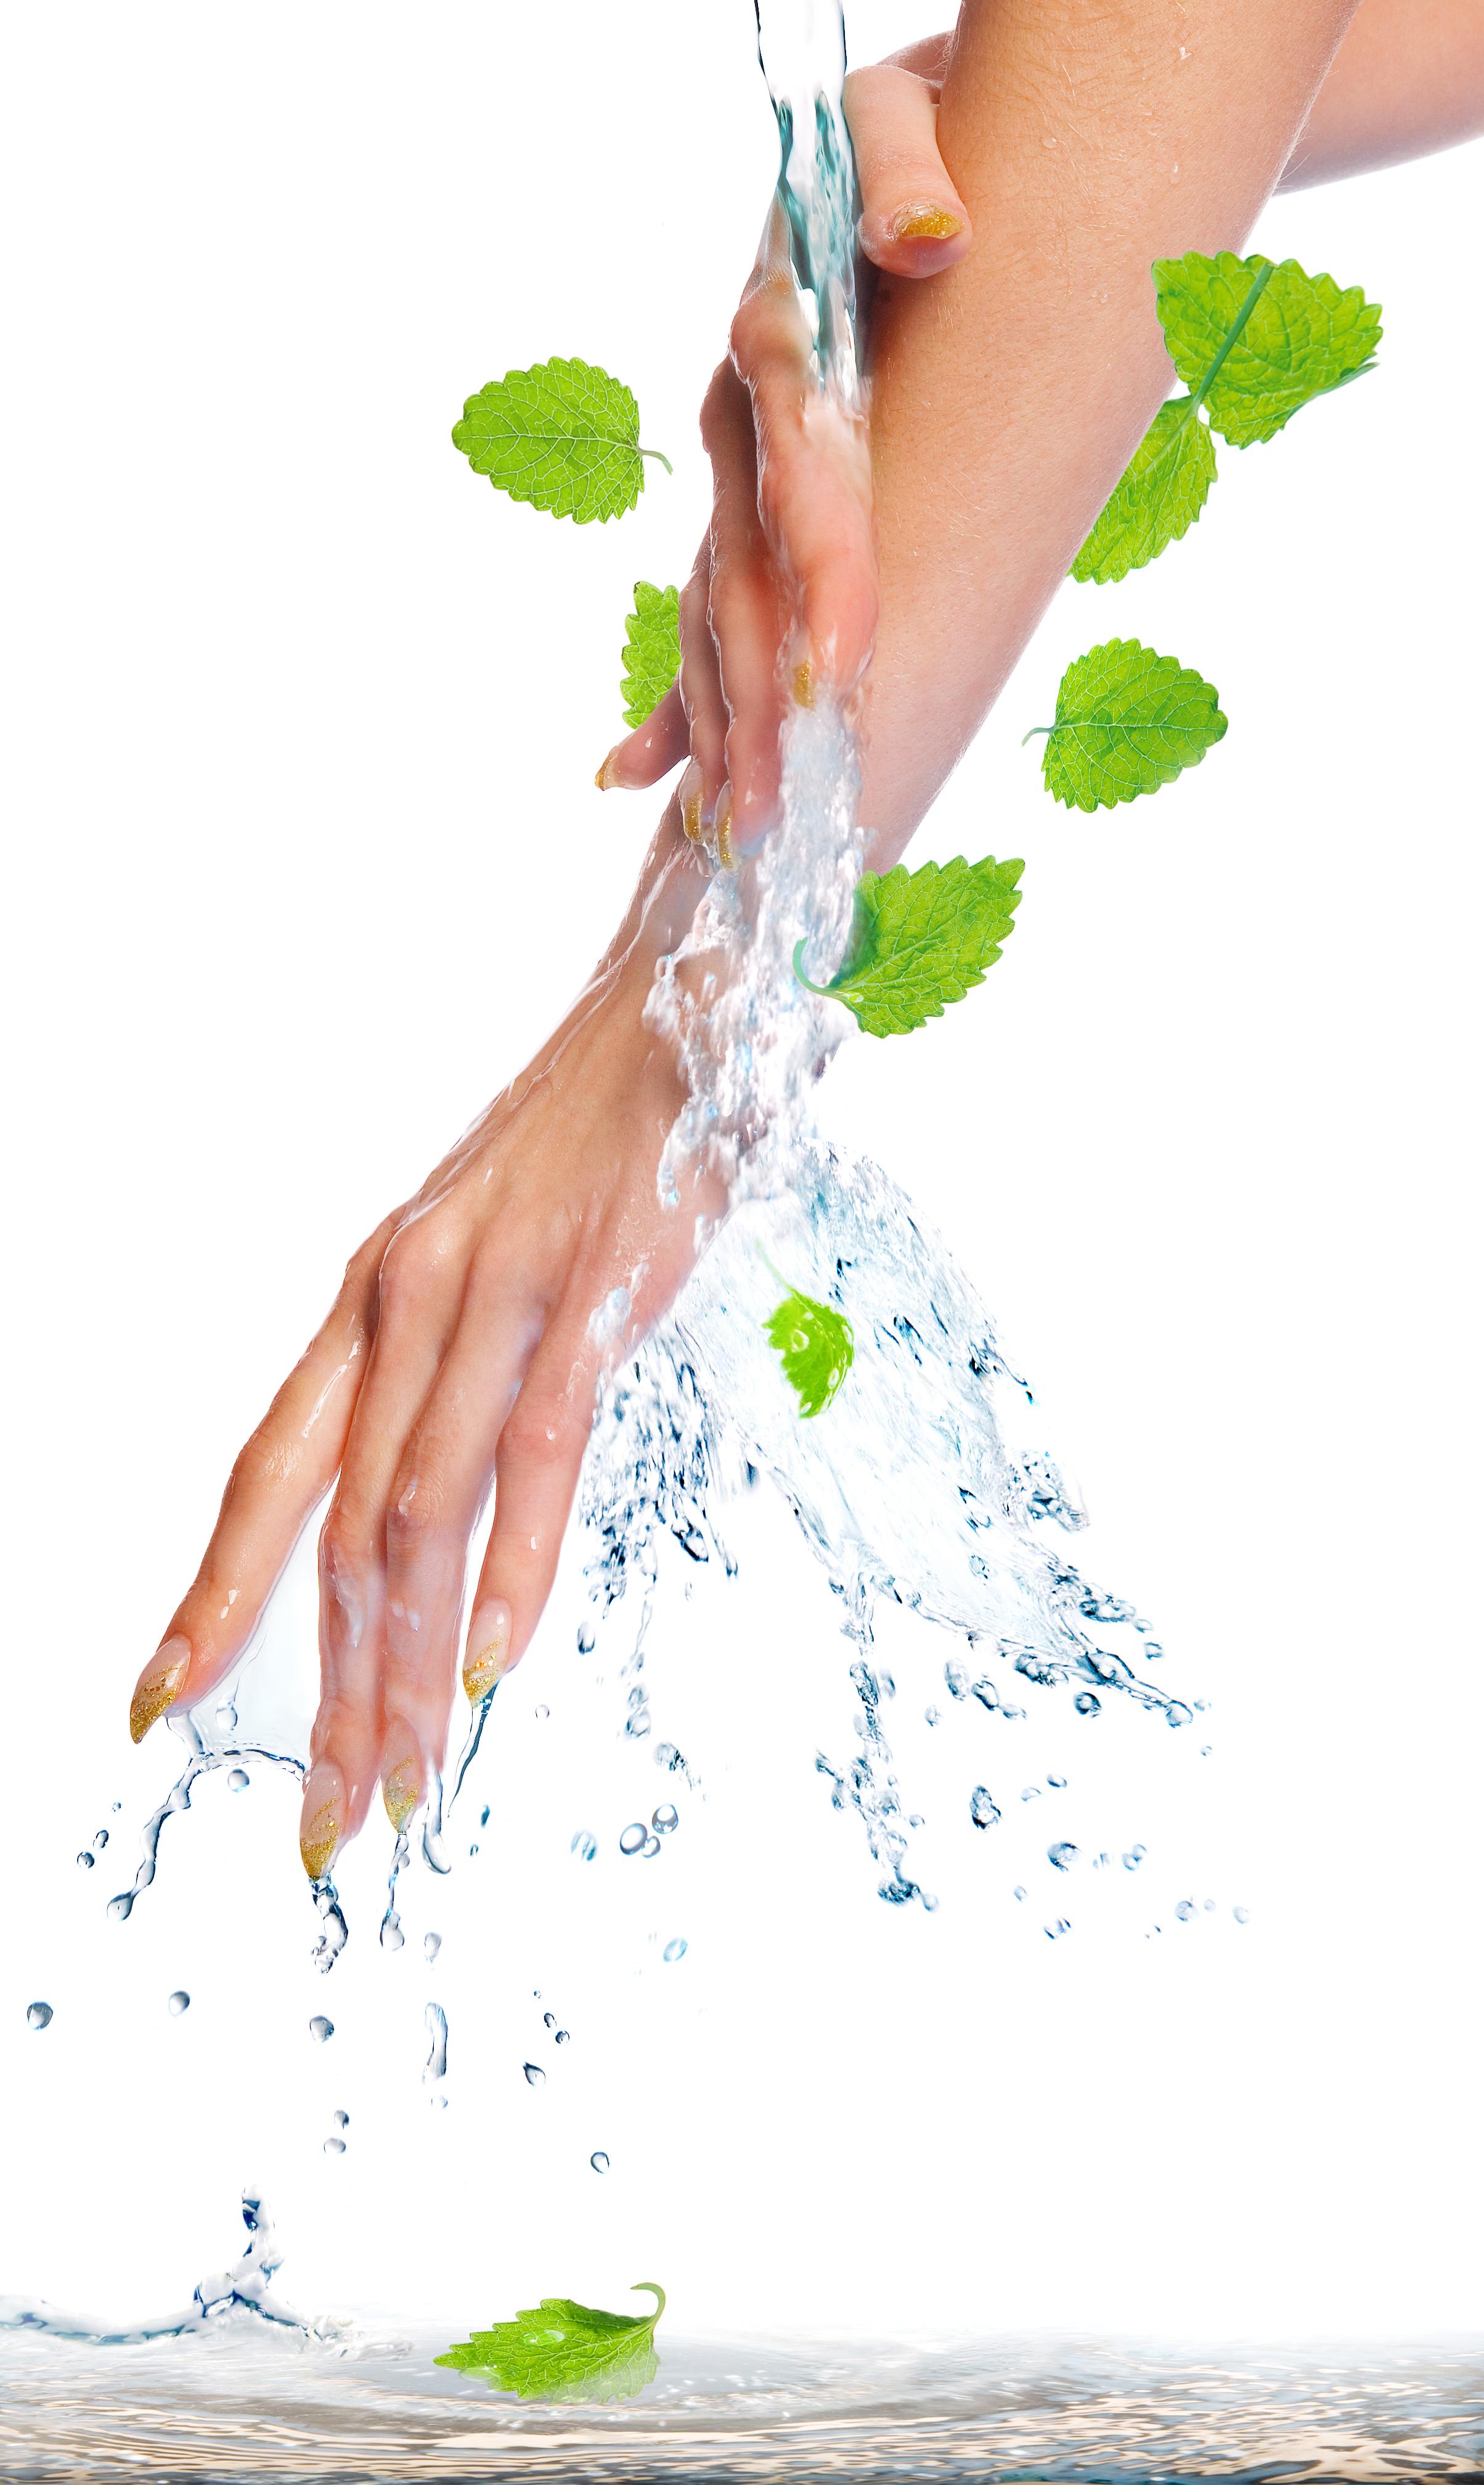 Water manicure